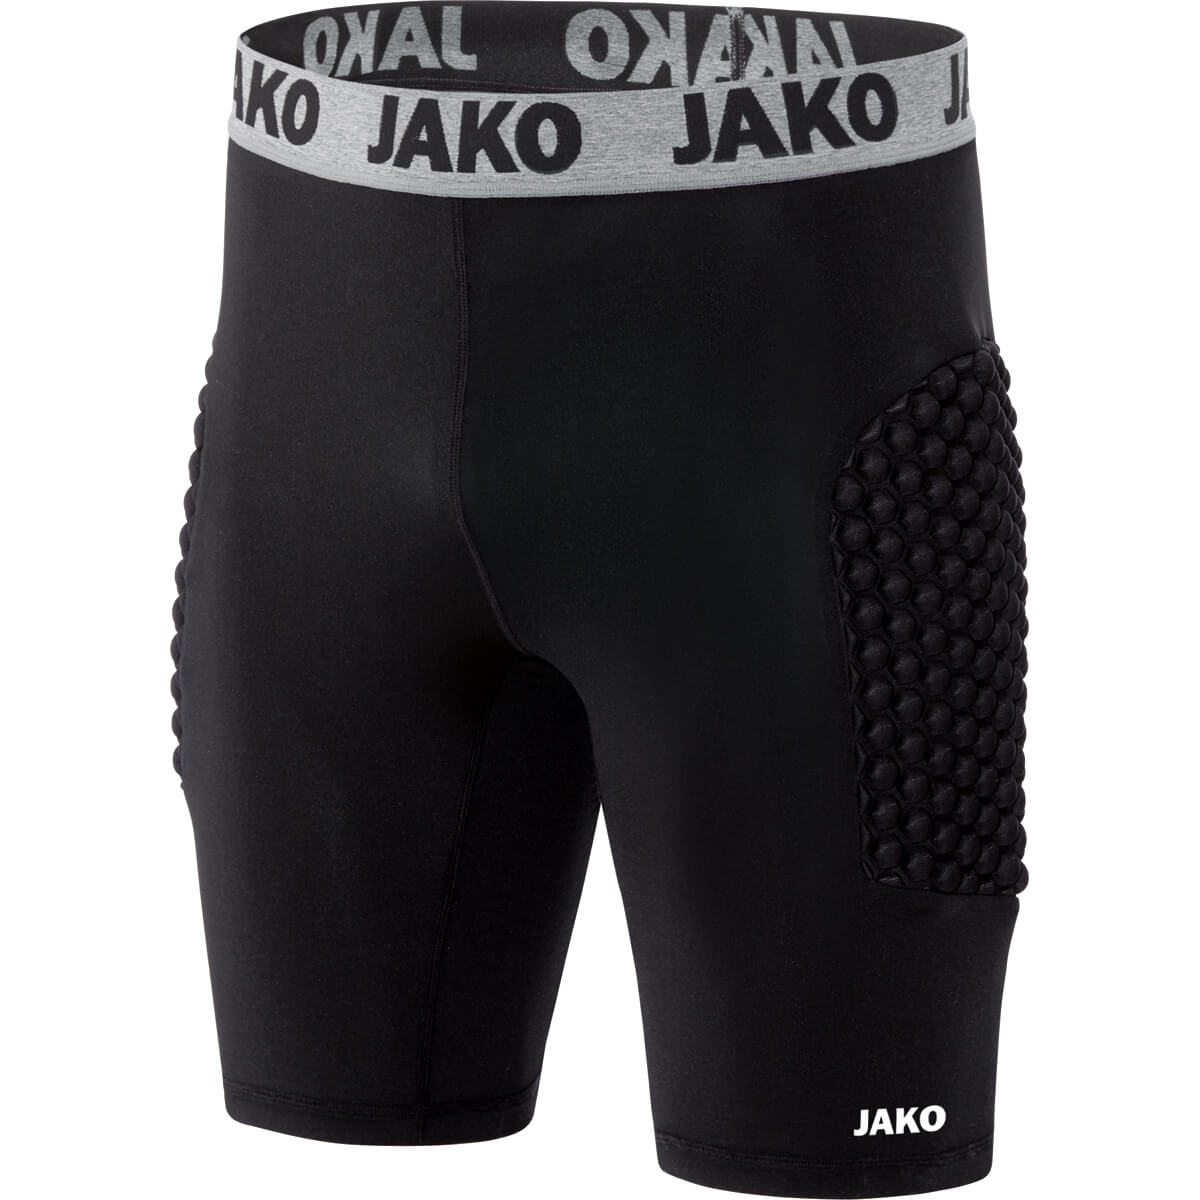 TW-Underwear Tight - Herren | Jako 8986